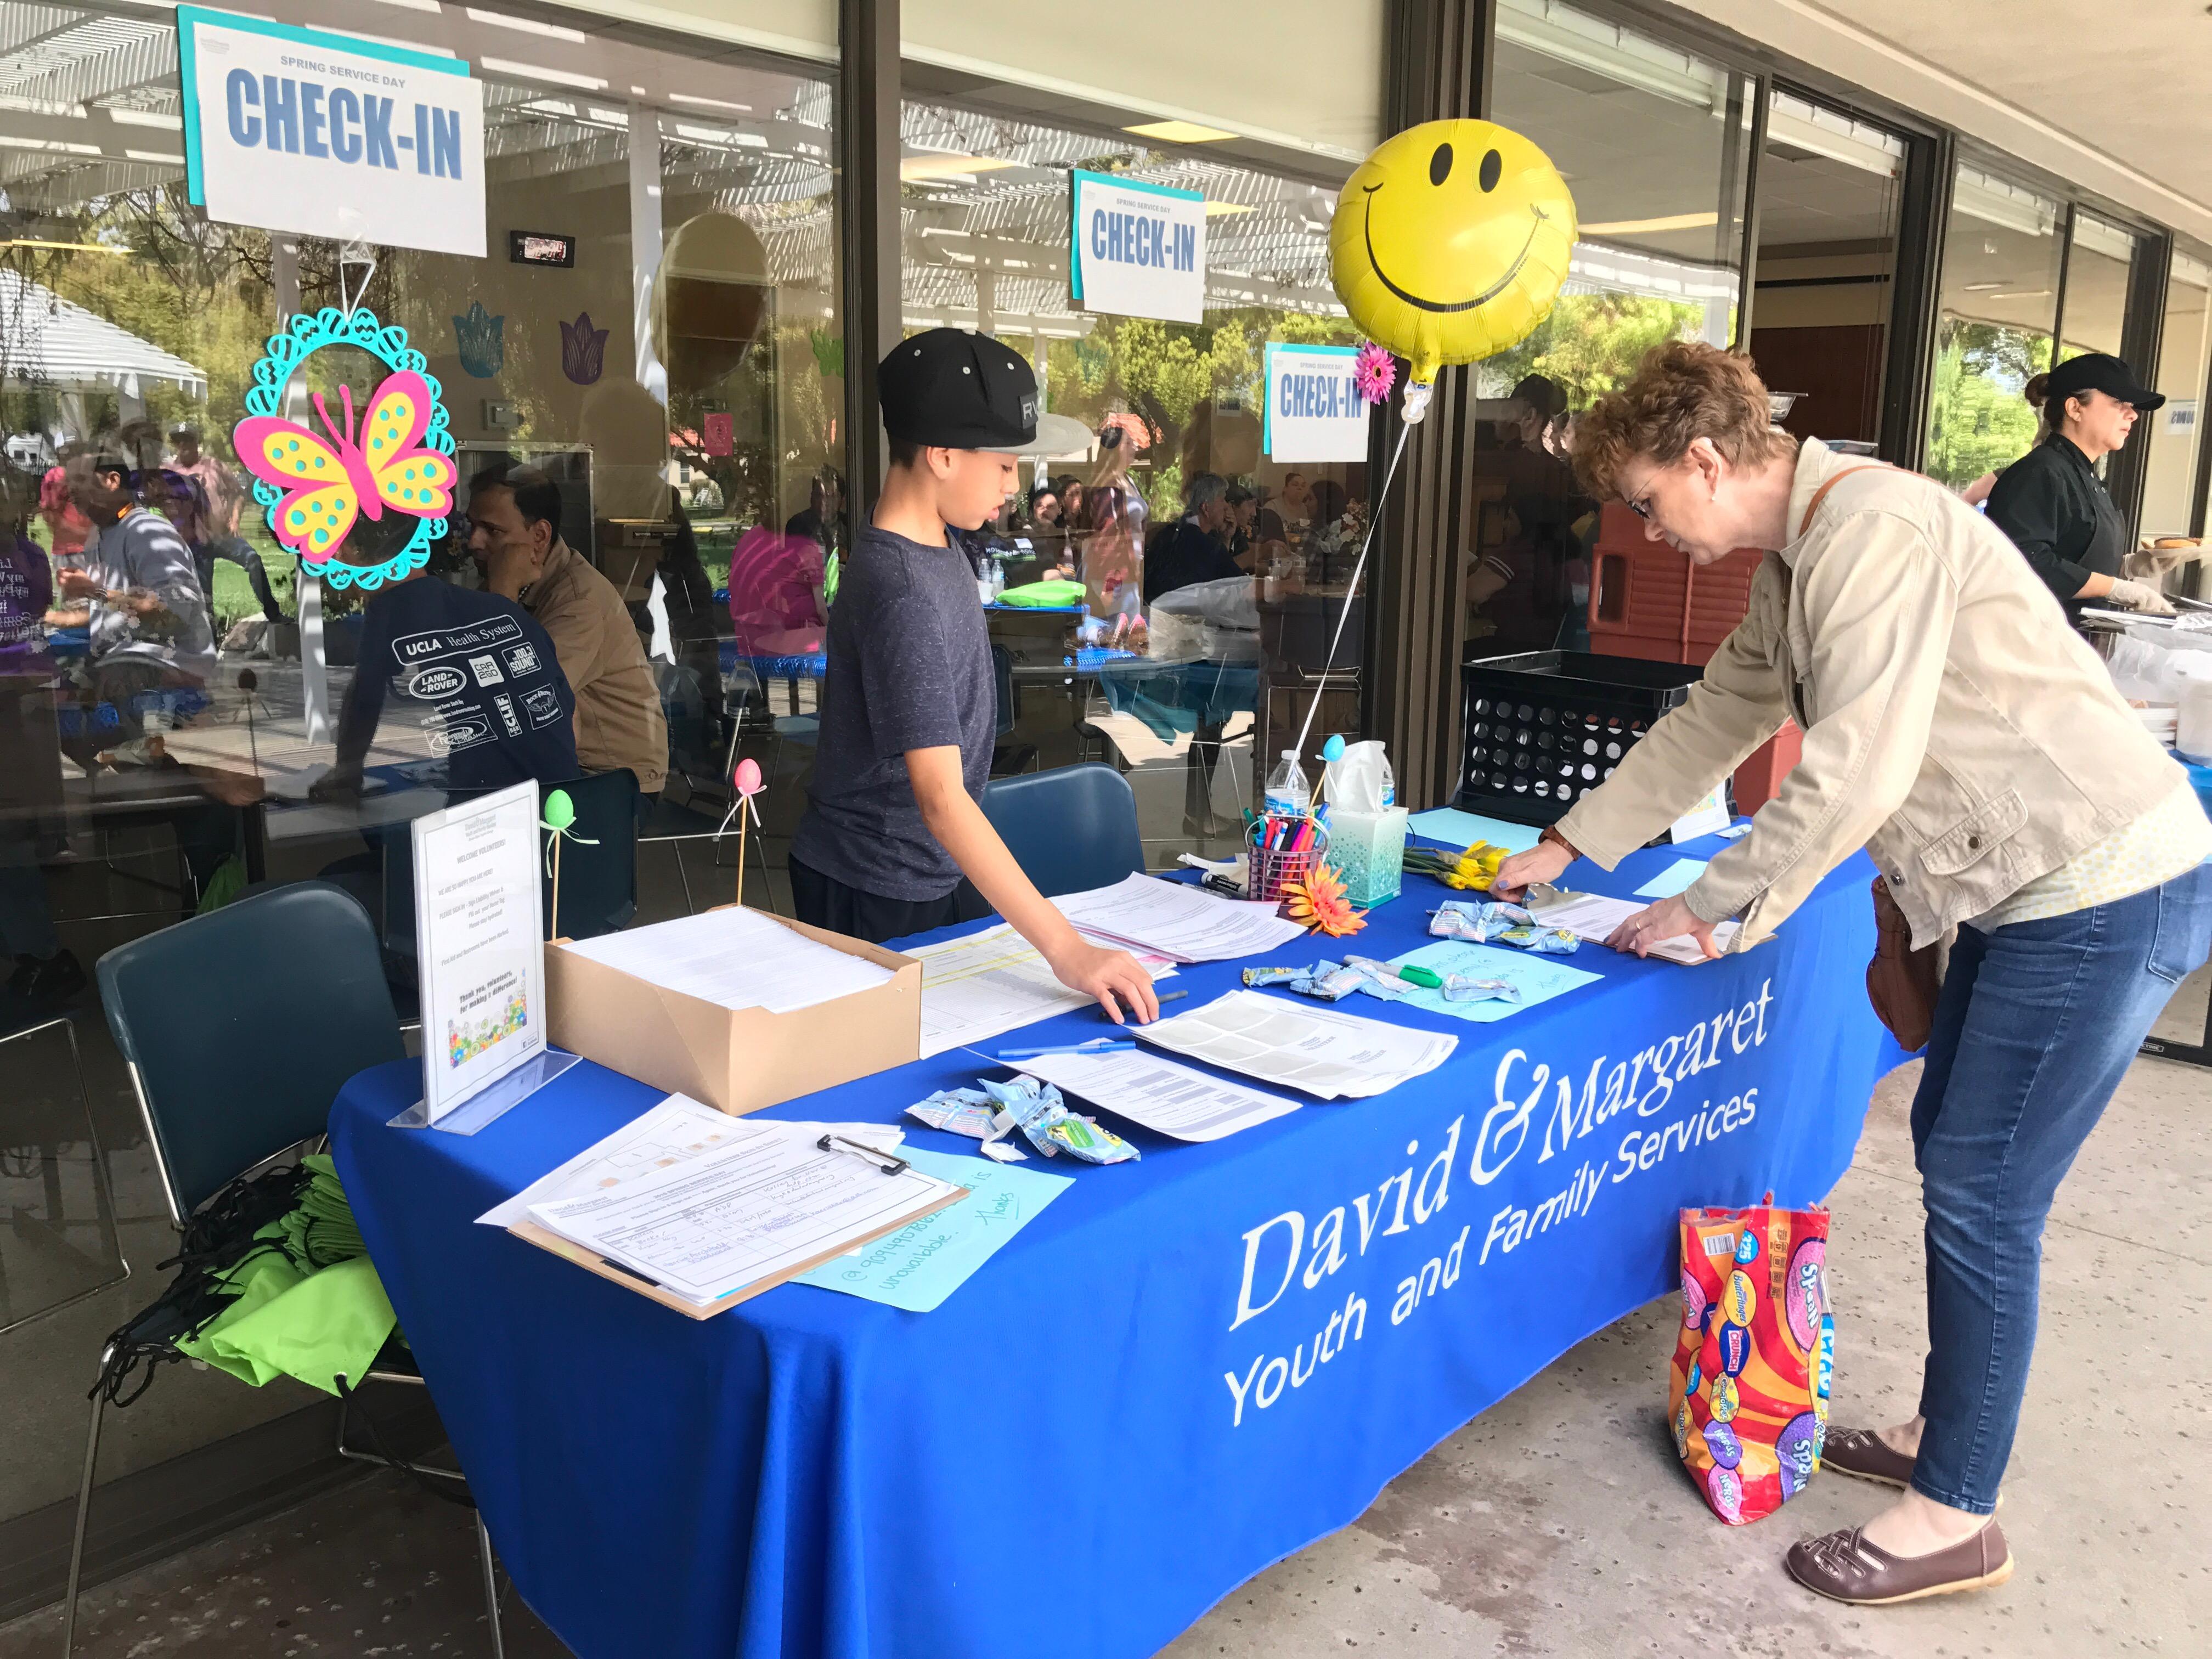 Volunteer at David & Margaret